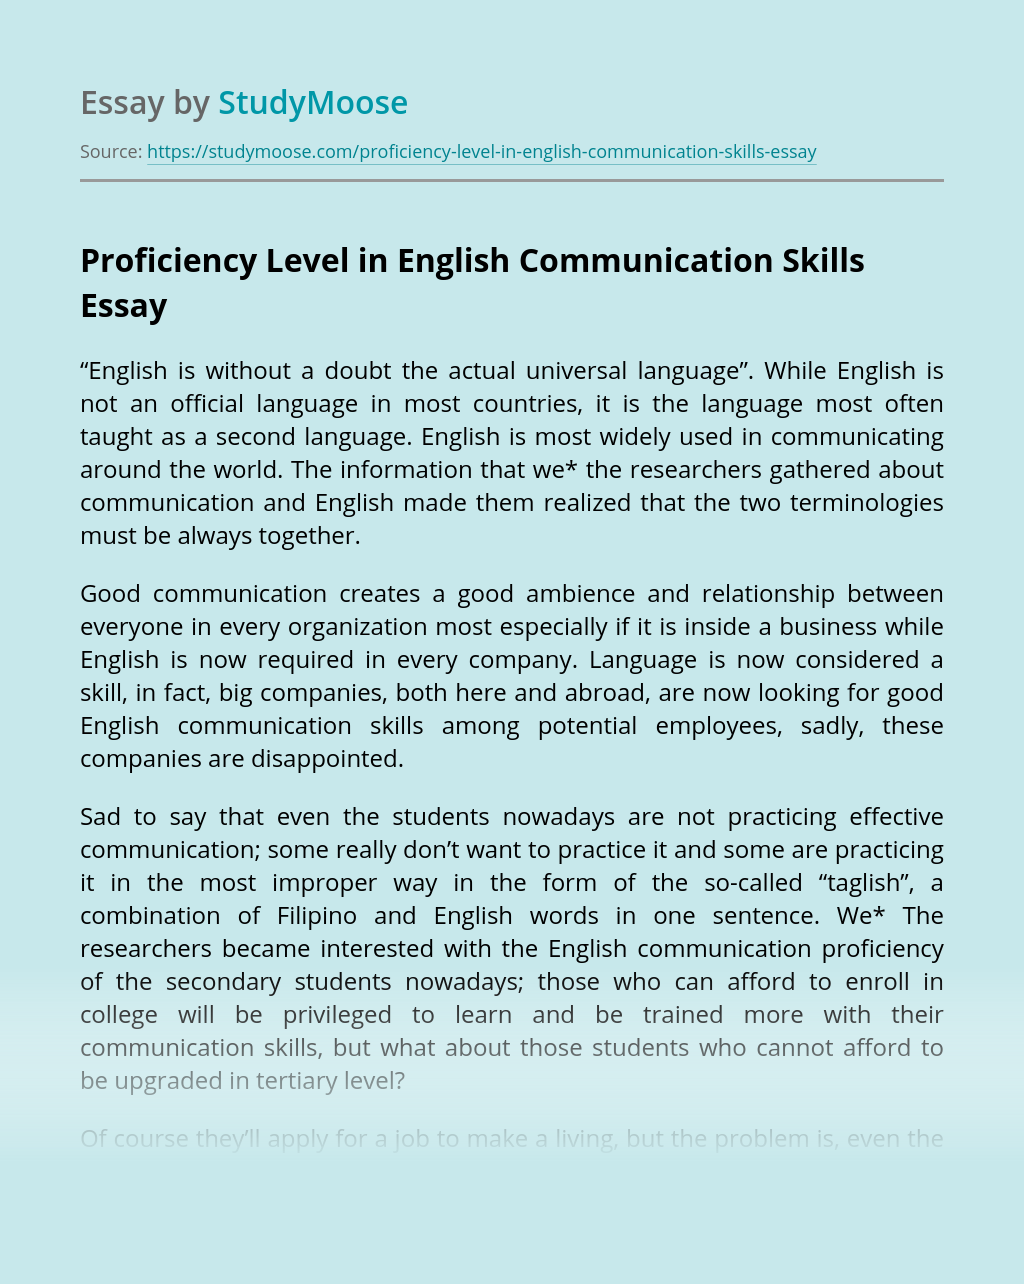 Proficiency Level in English Communication Skills